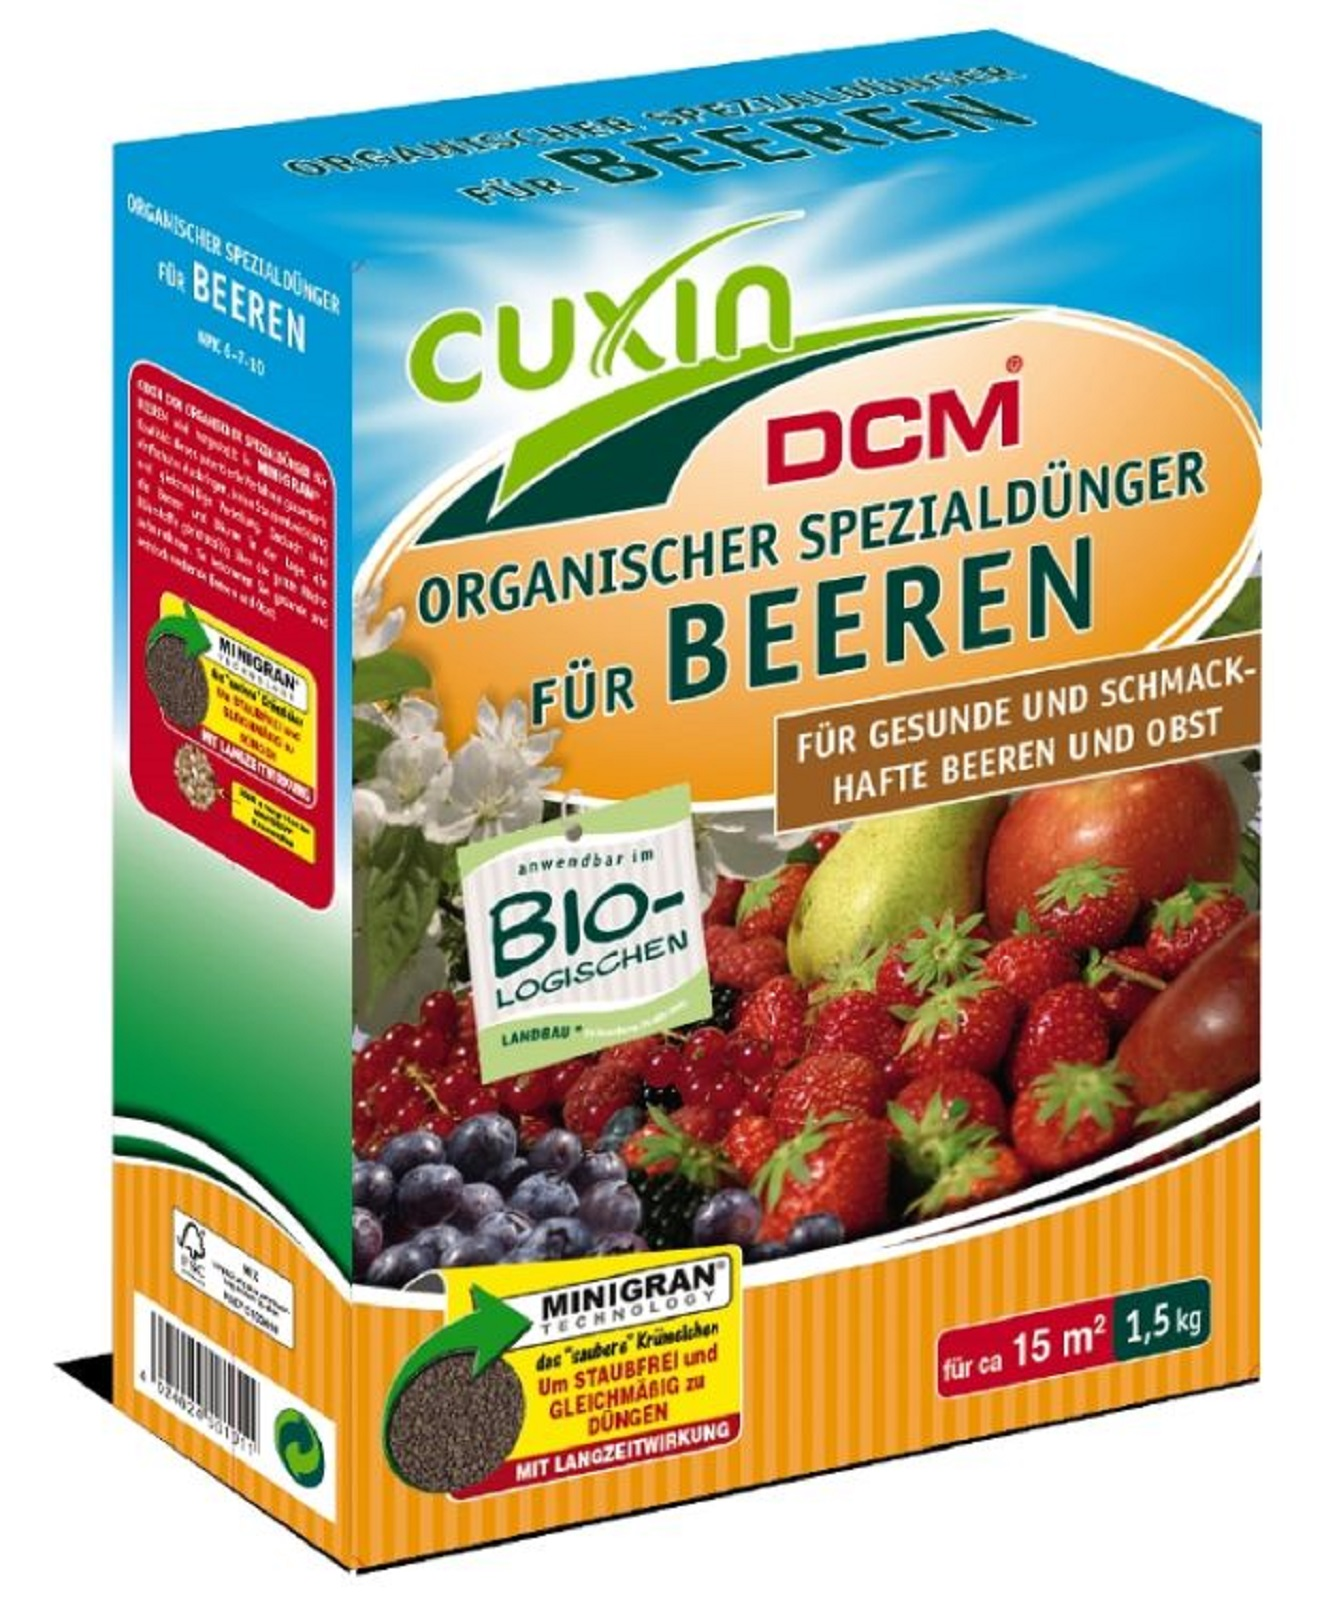 Cuxin  Dünger für Beerensträucher Obstbäume Beeren 1,5 kg organischer Dünger